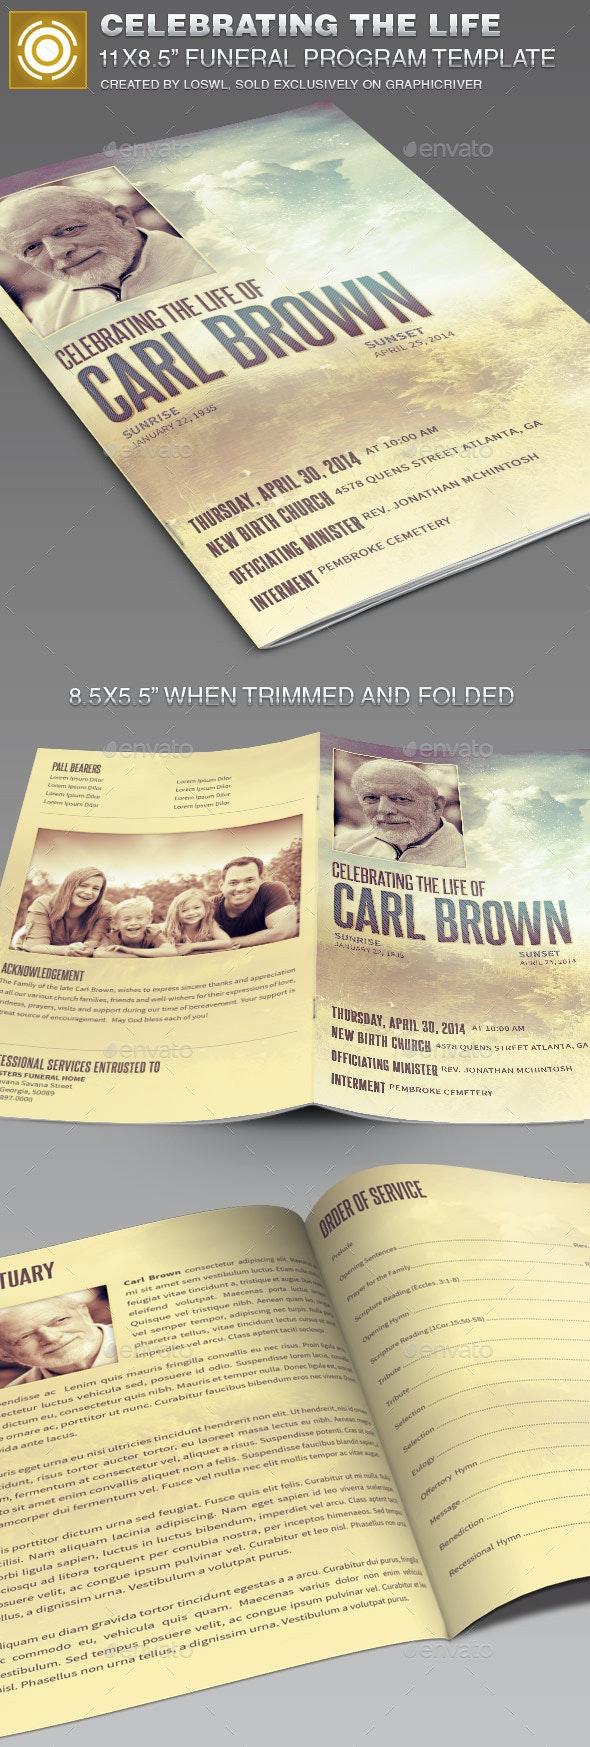 Celebrating the Life Funeral Program Template 014 - Informational Brochures